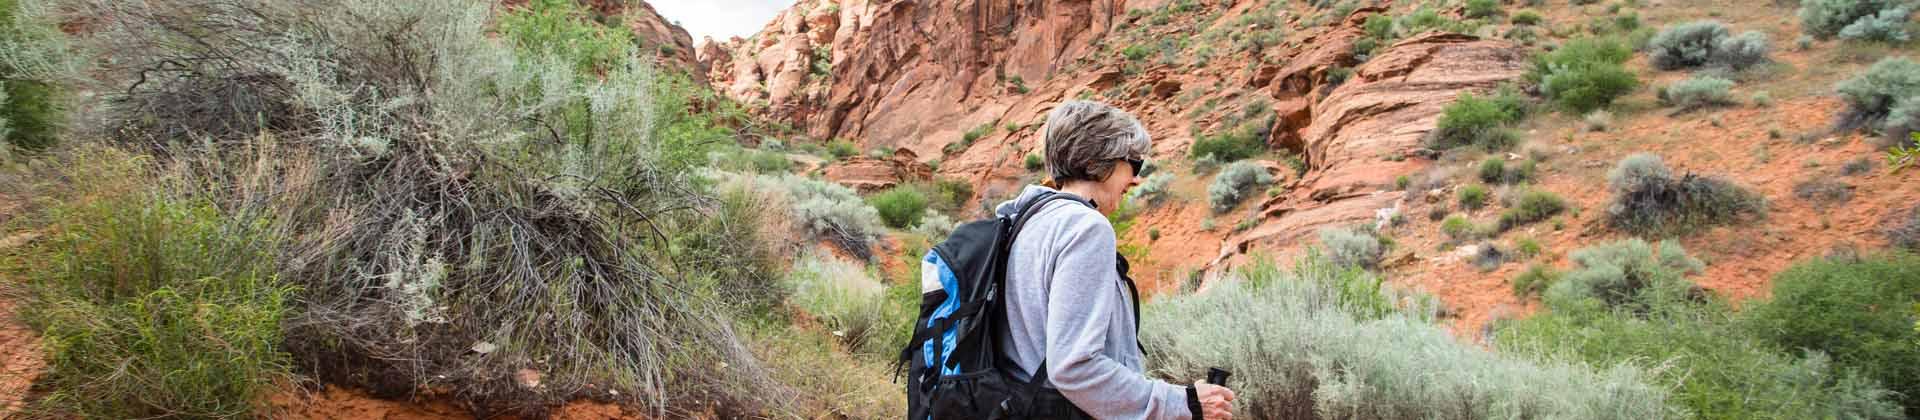 A senior woman hiking